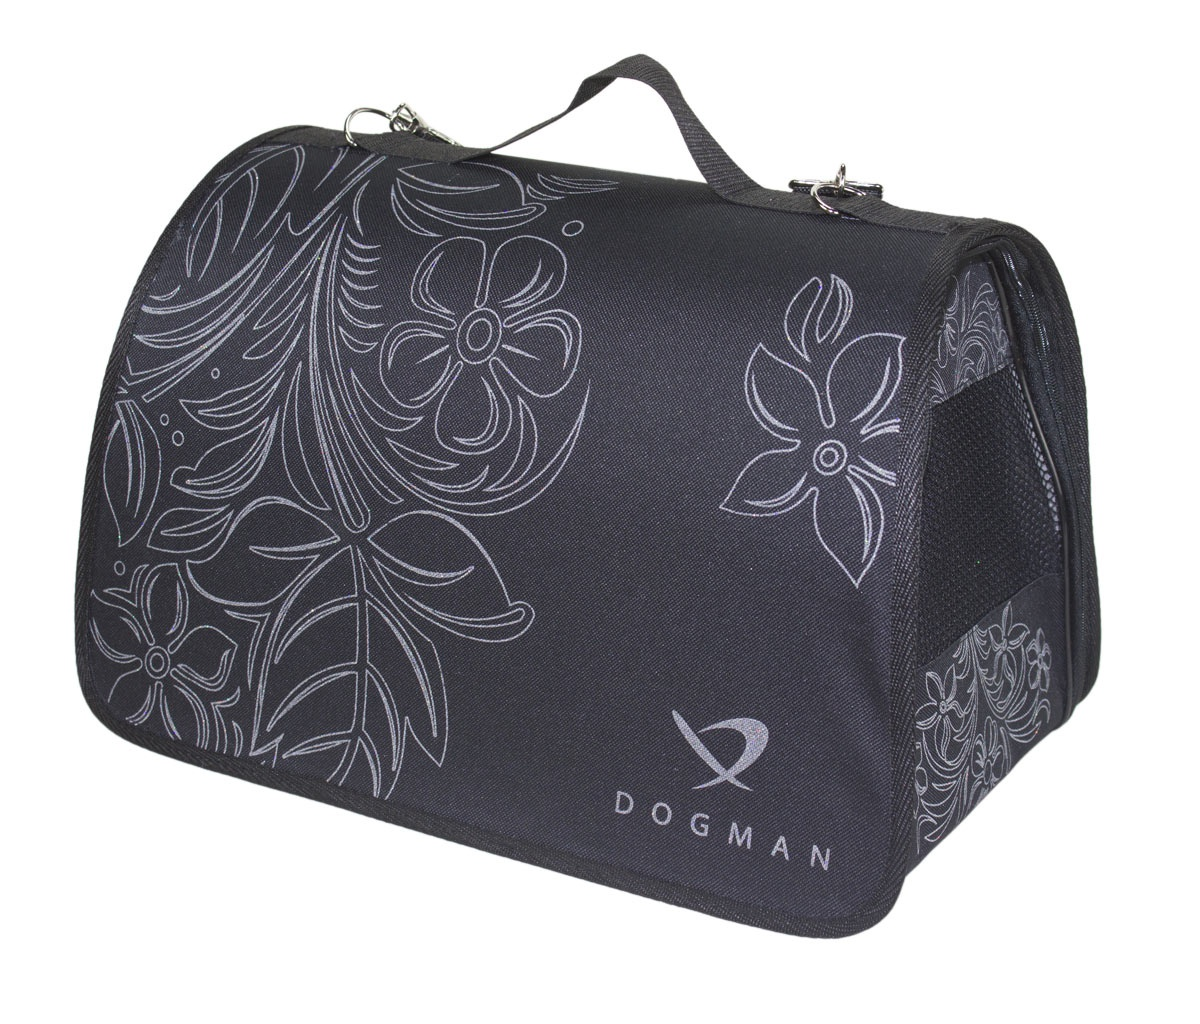 DOGMAN сумка-переноска с мехом Лира №4